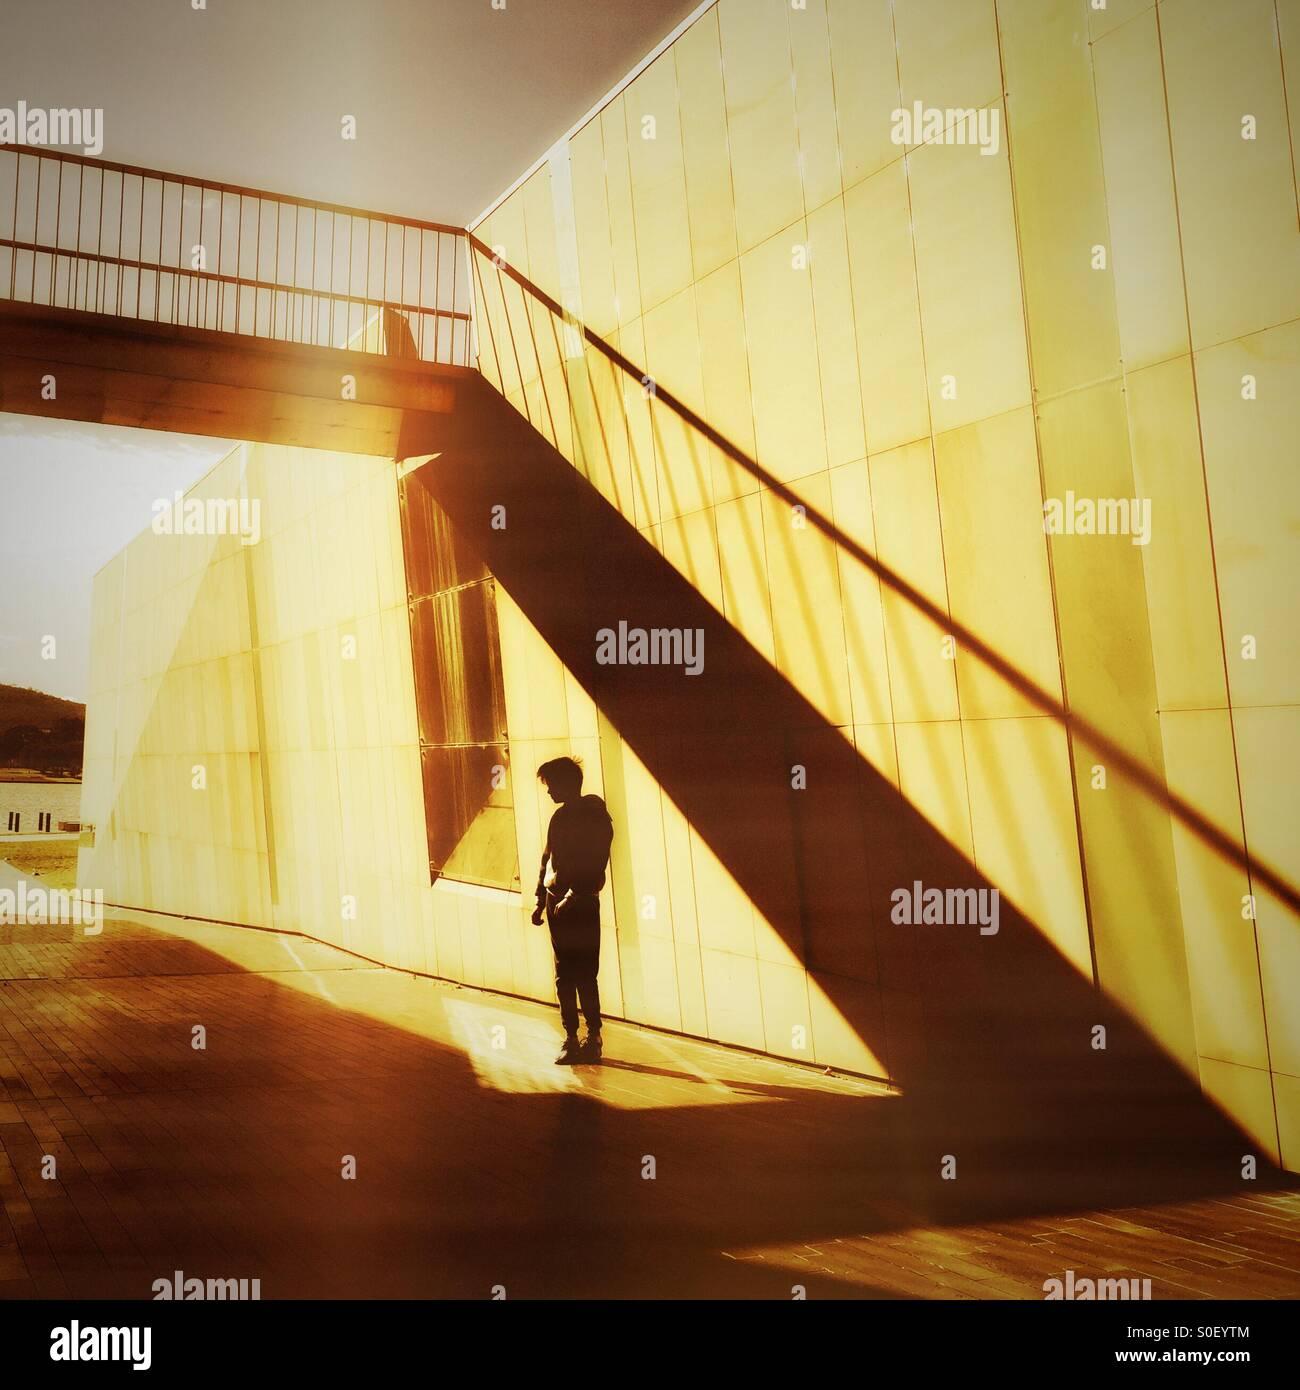 Garçon dans un passage souterrain ensoleillée Photo Stock